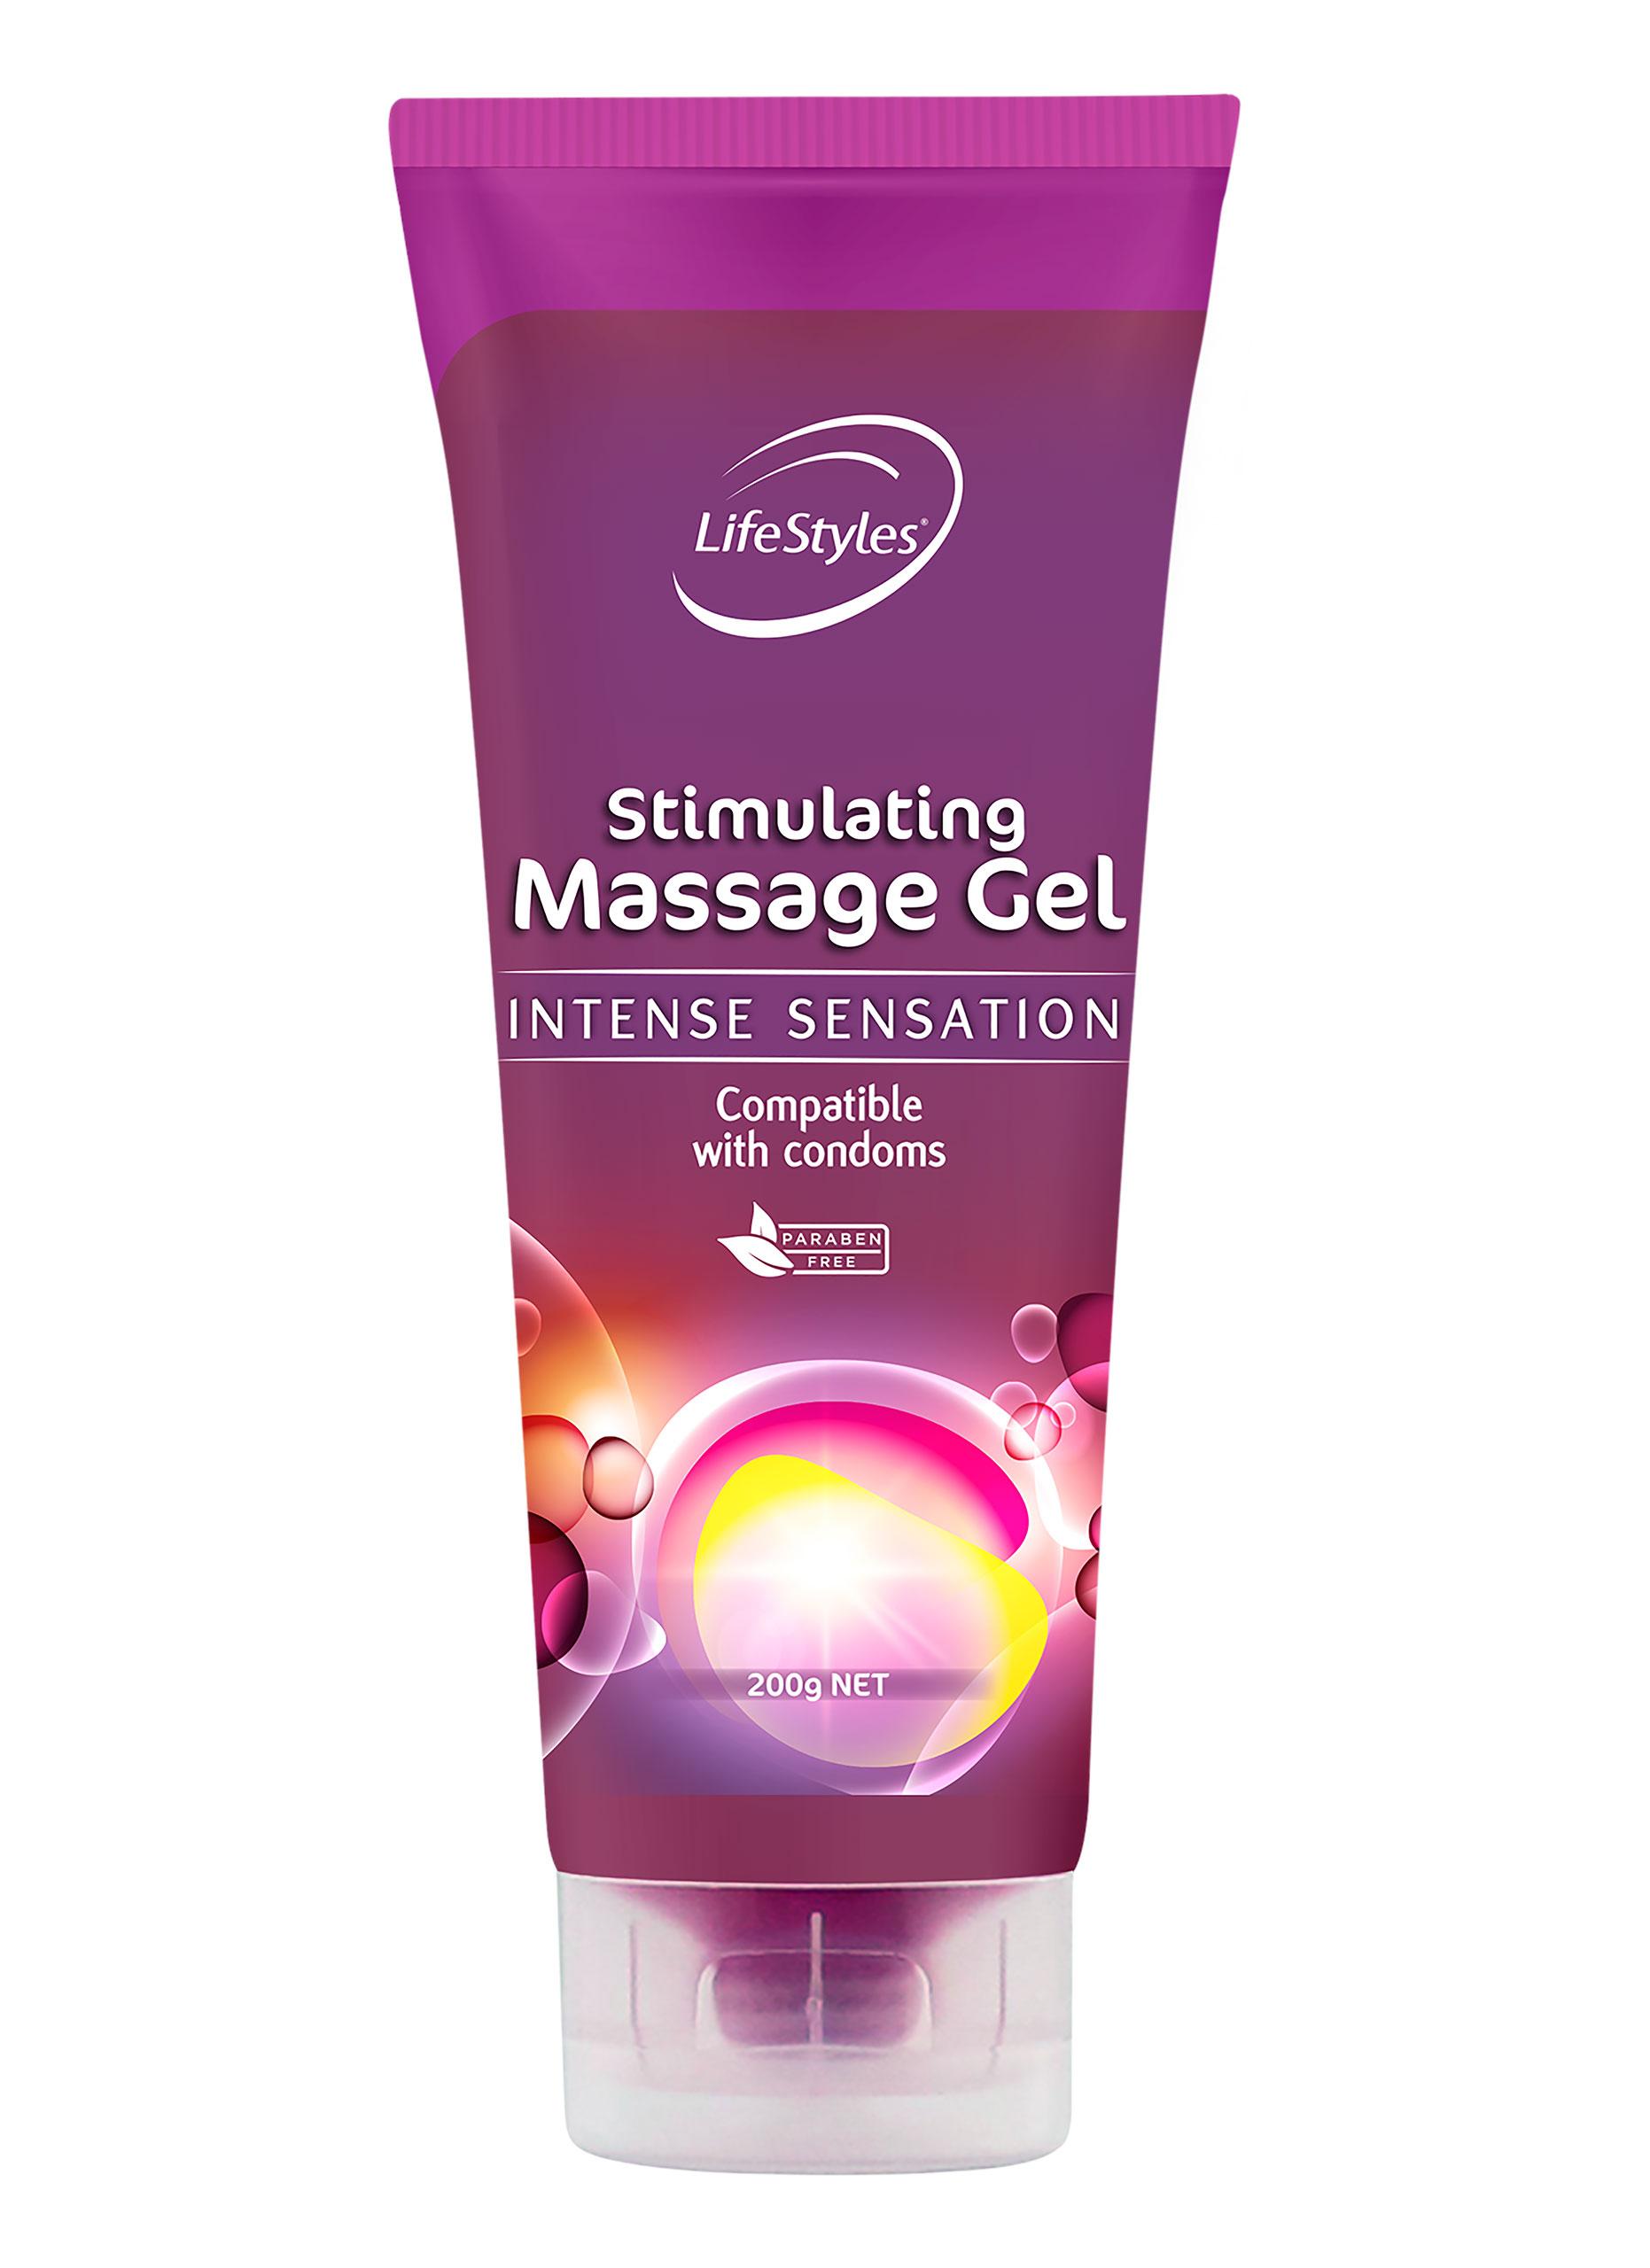 Stimulating Massage Gel